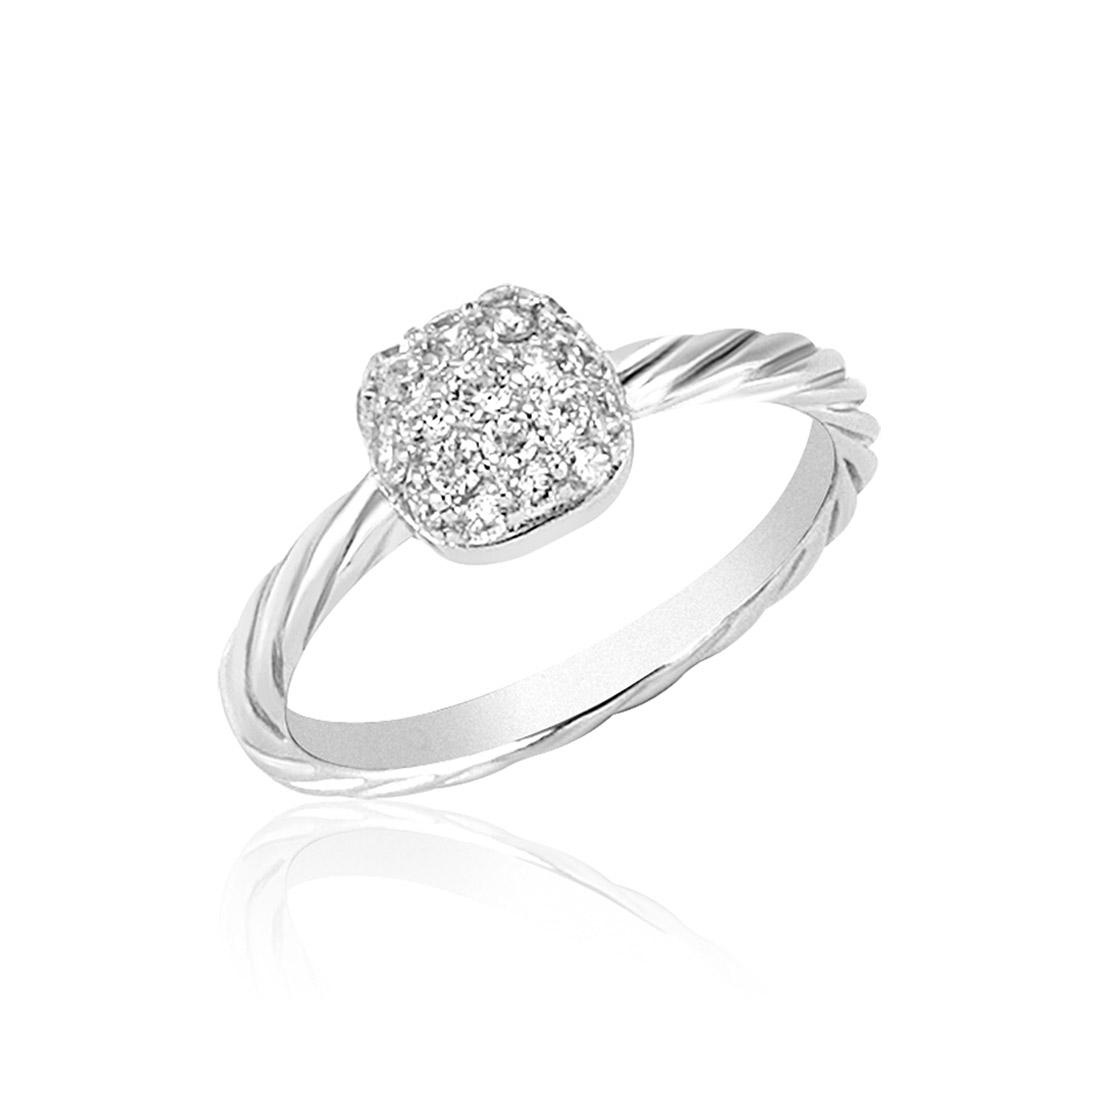 Sirius Silver Ring - High Street Jewelry